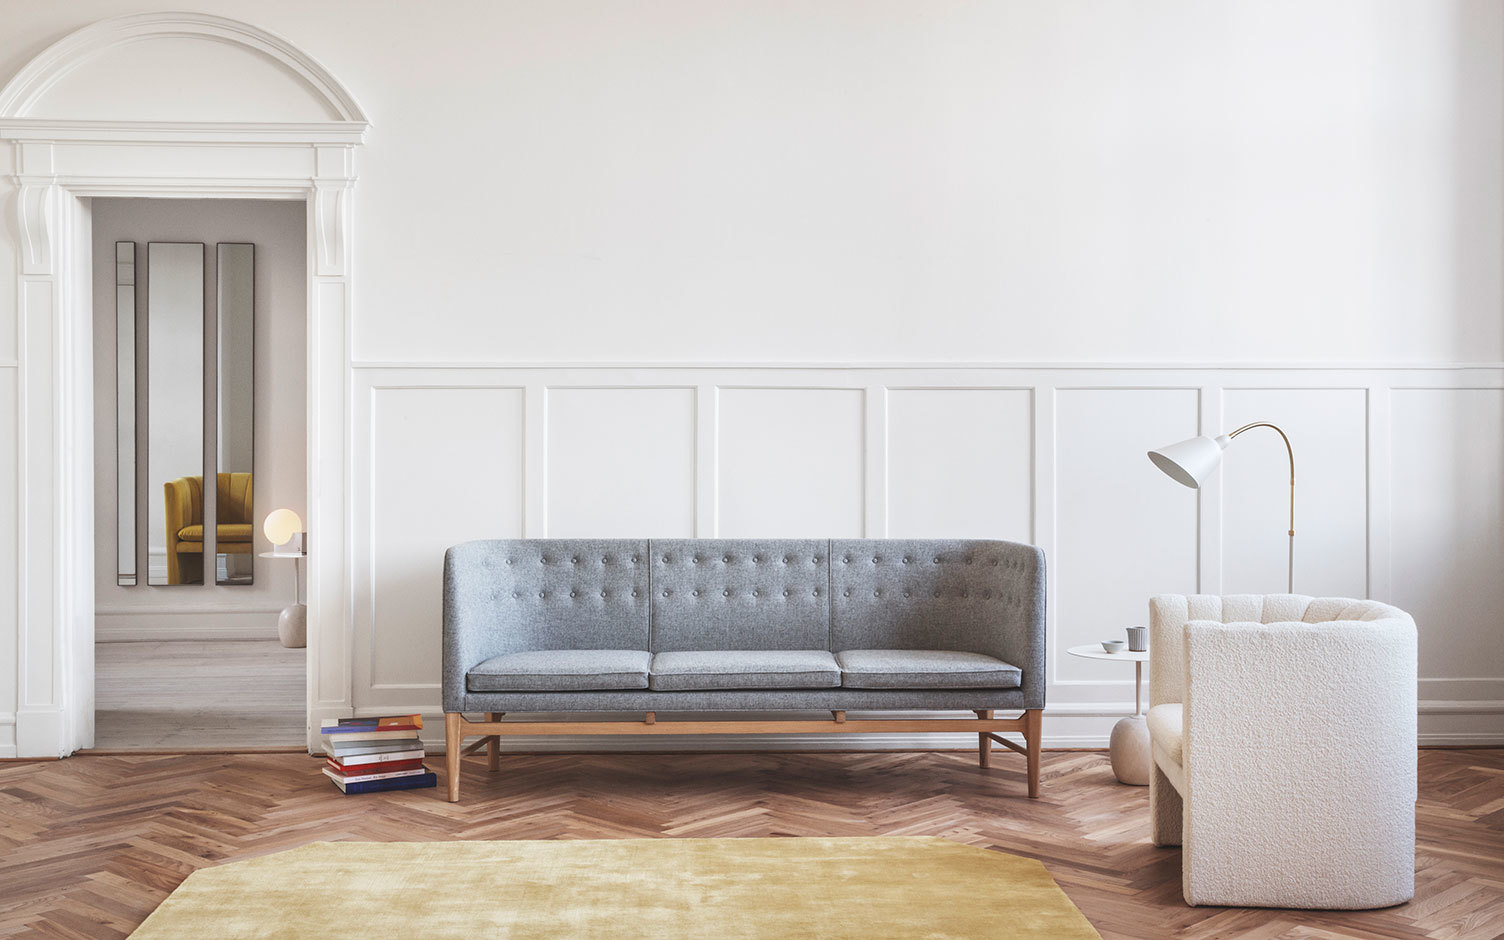 Lounge Seating catalogue image